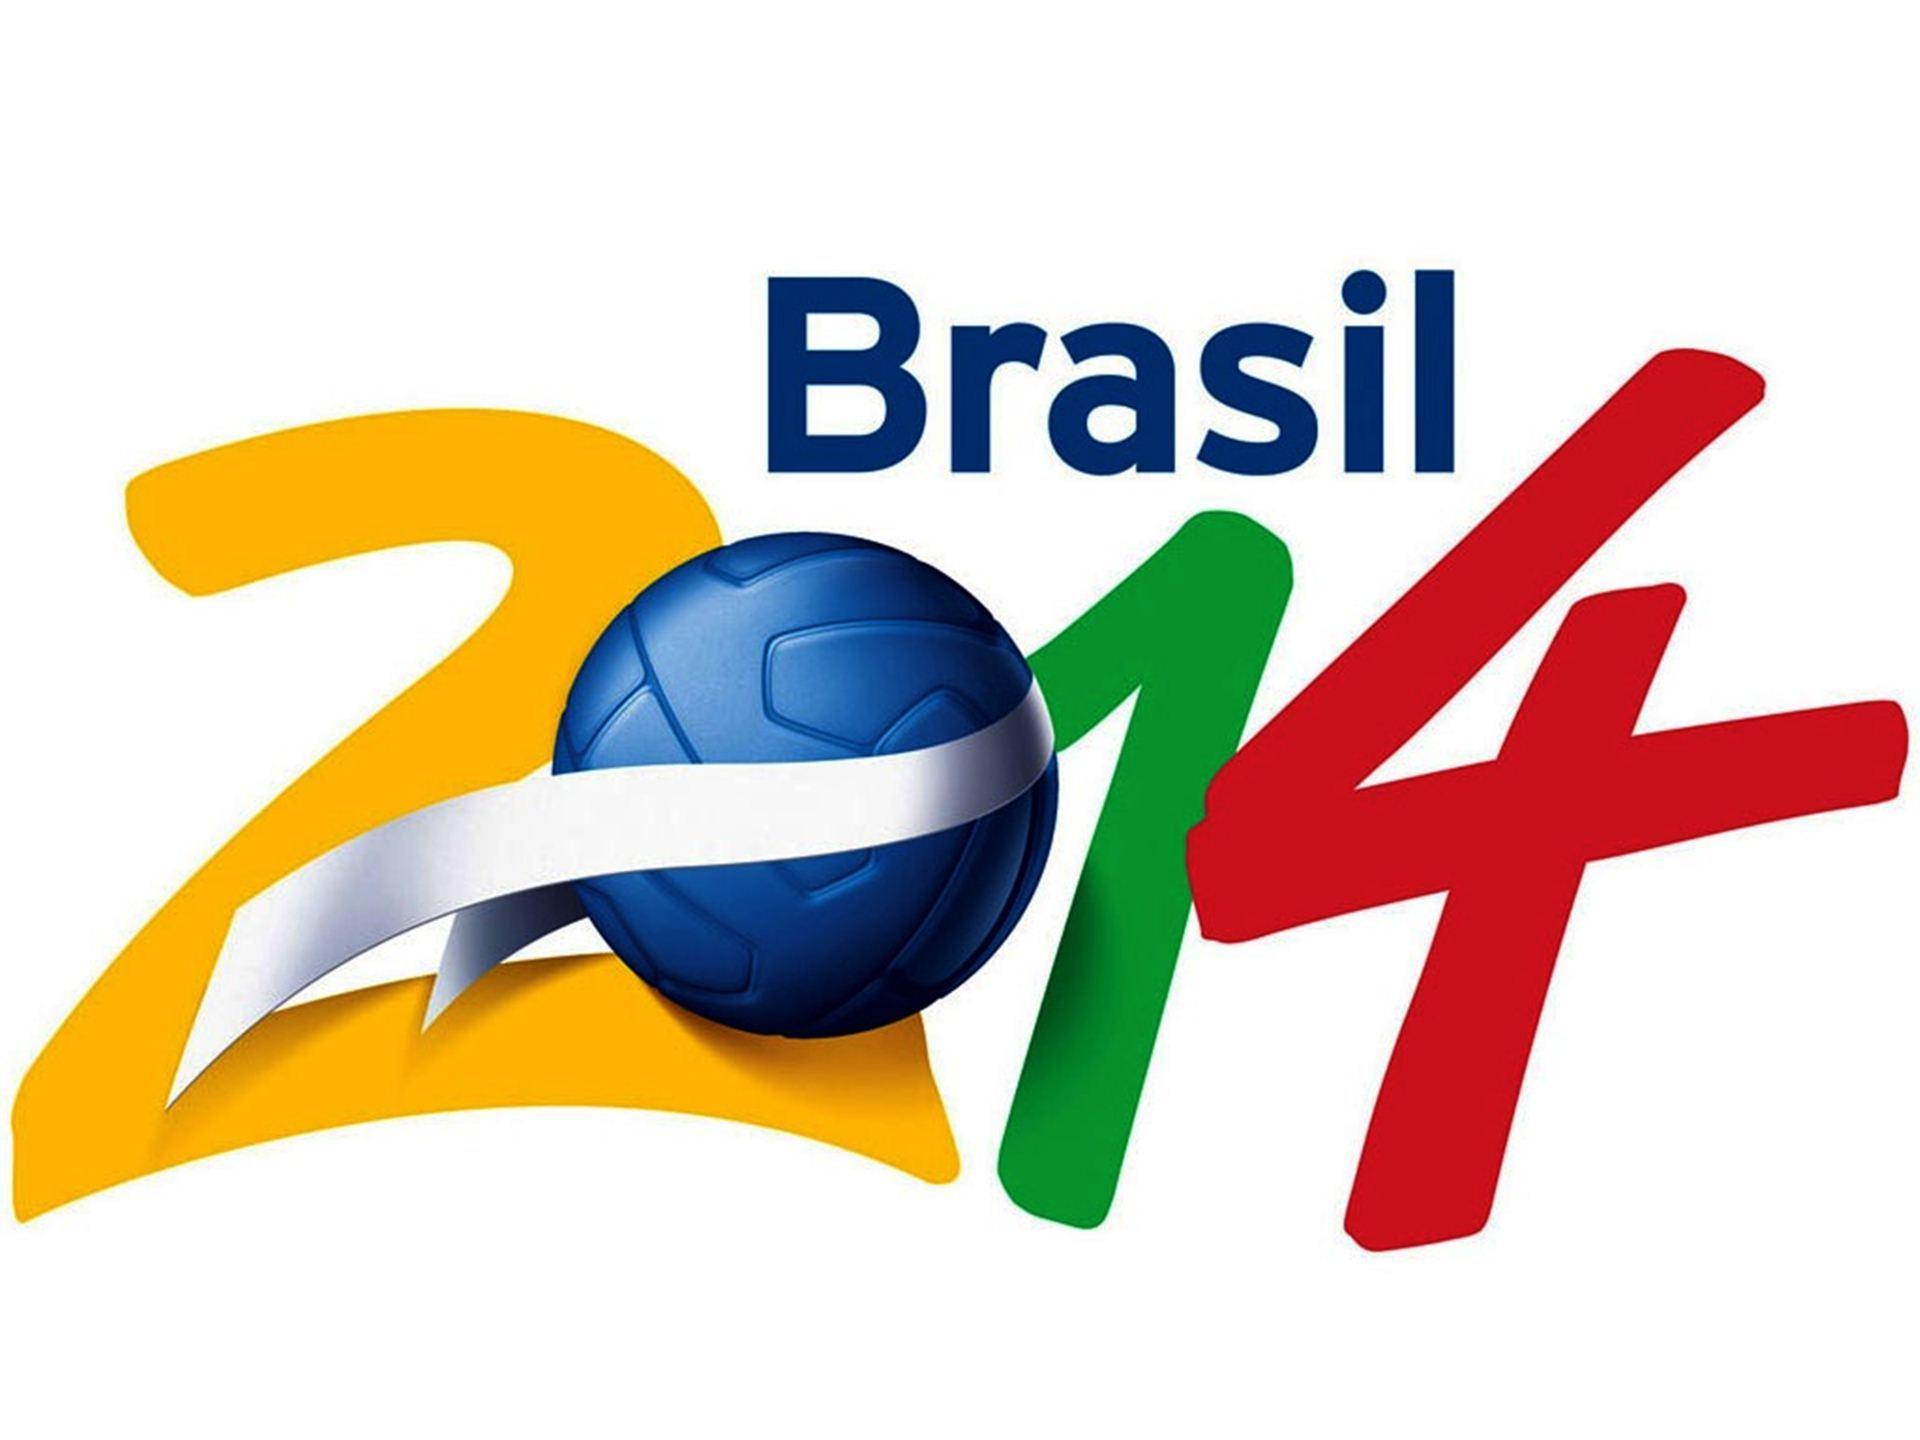 b47d04afa4ef801f20c9_World-Cup-Fifa-Brazil-2014_2.jpg